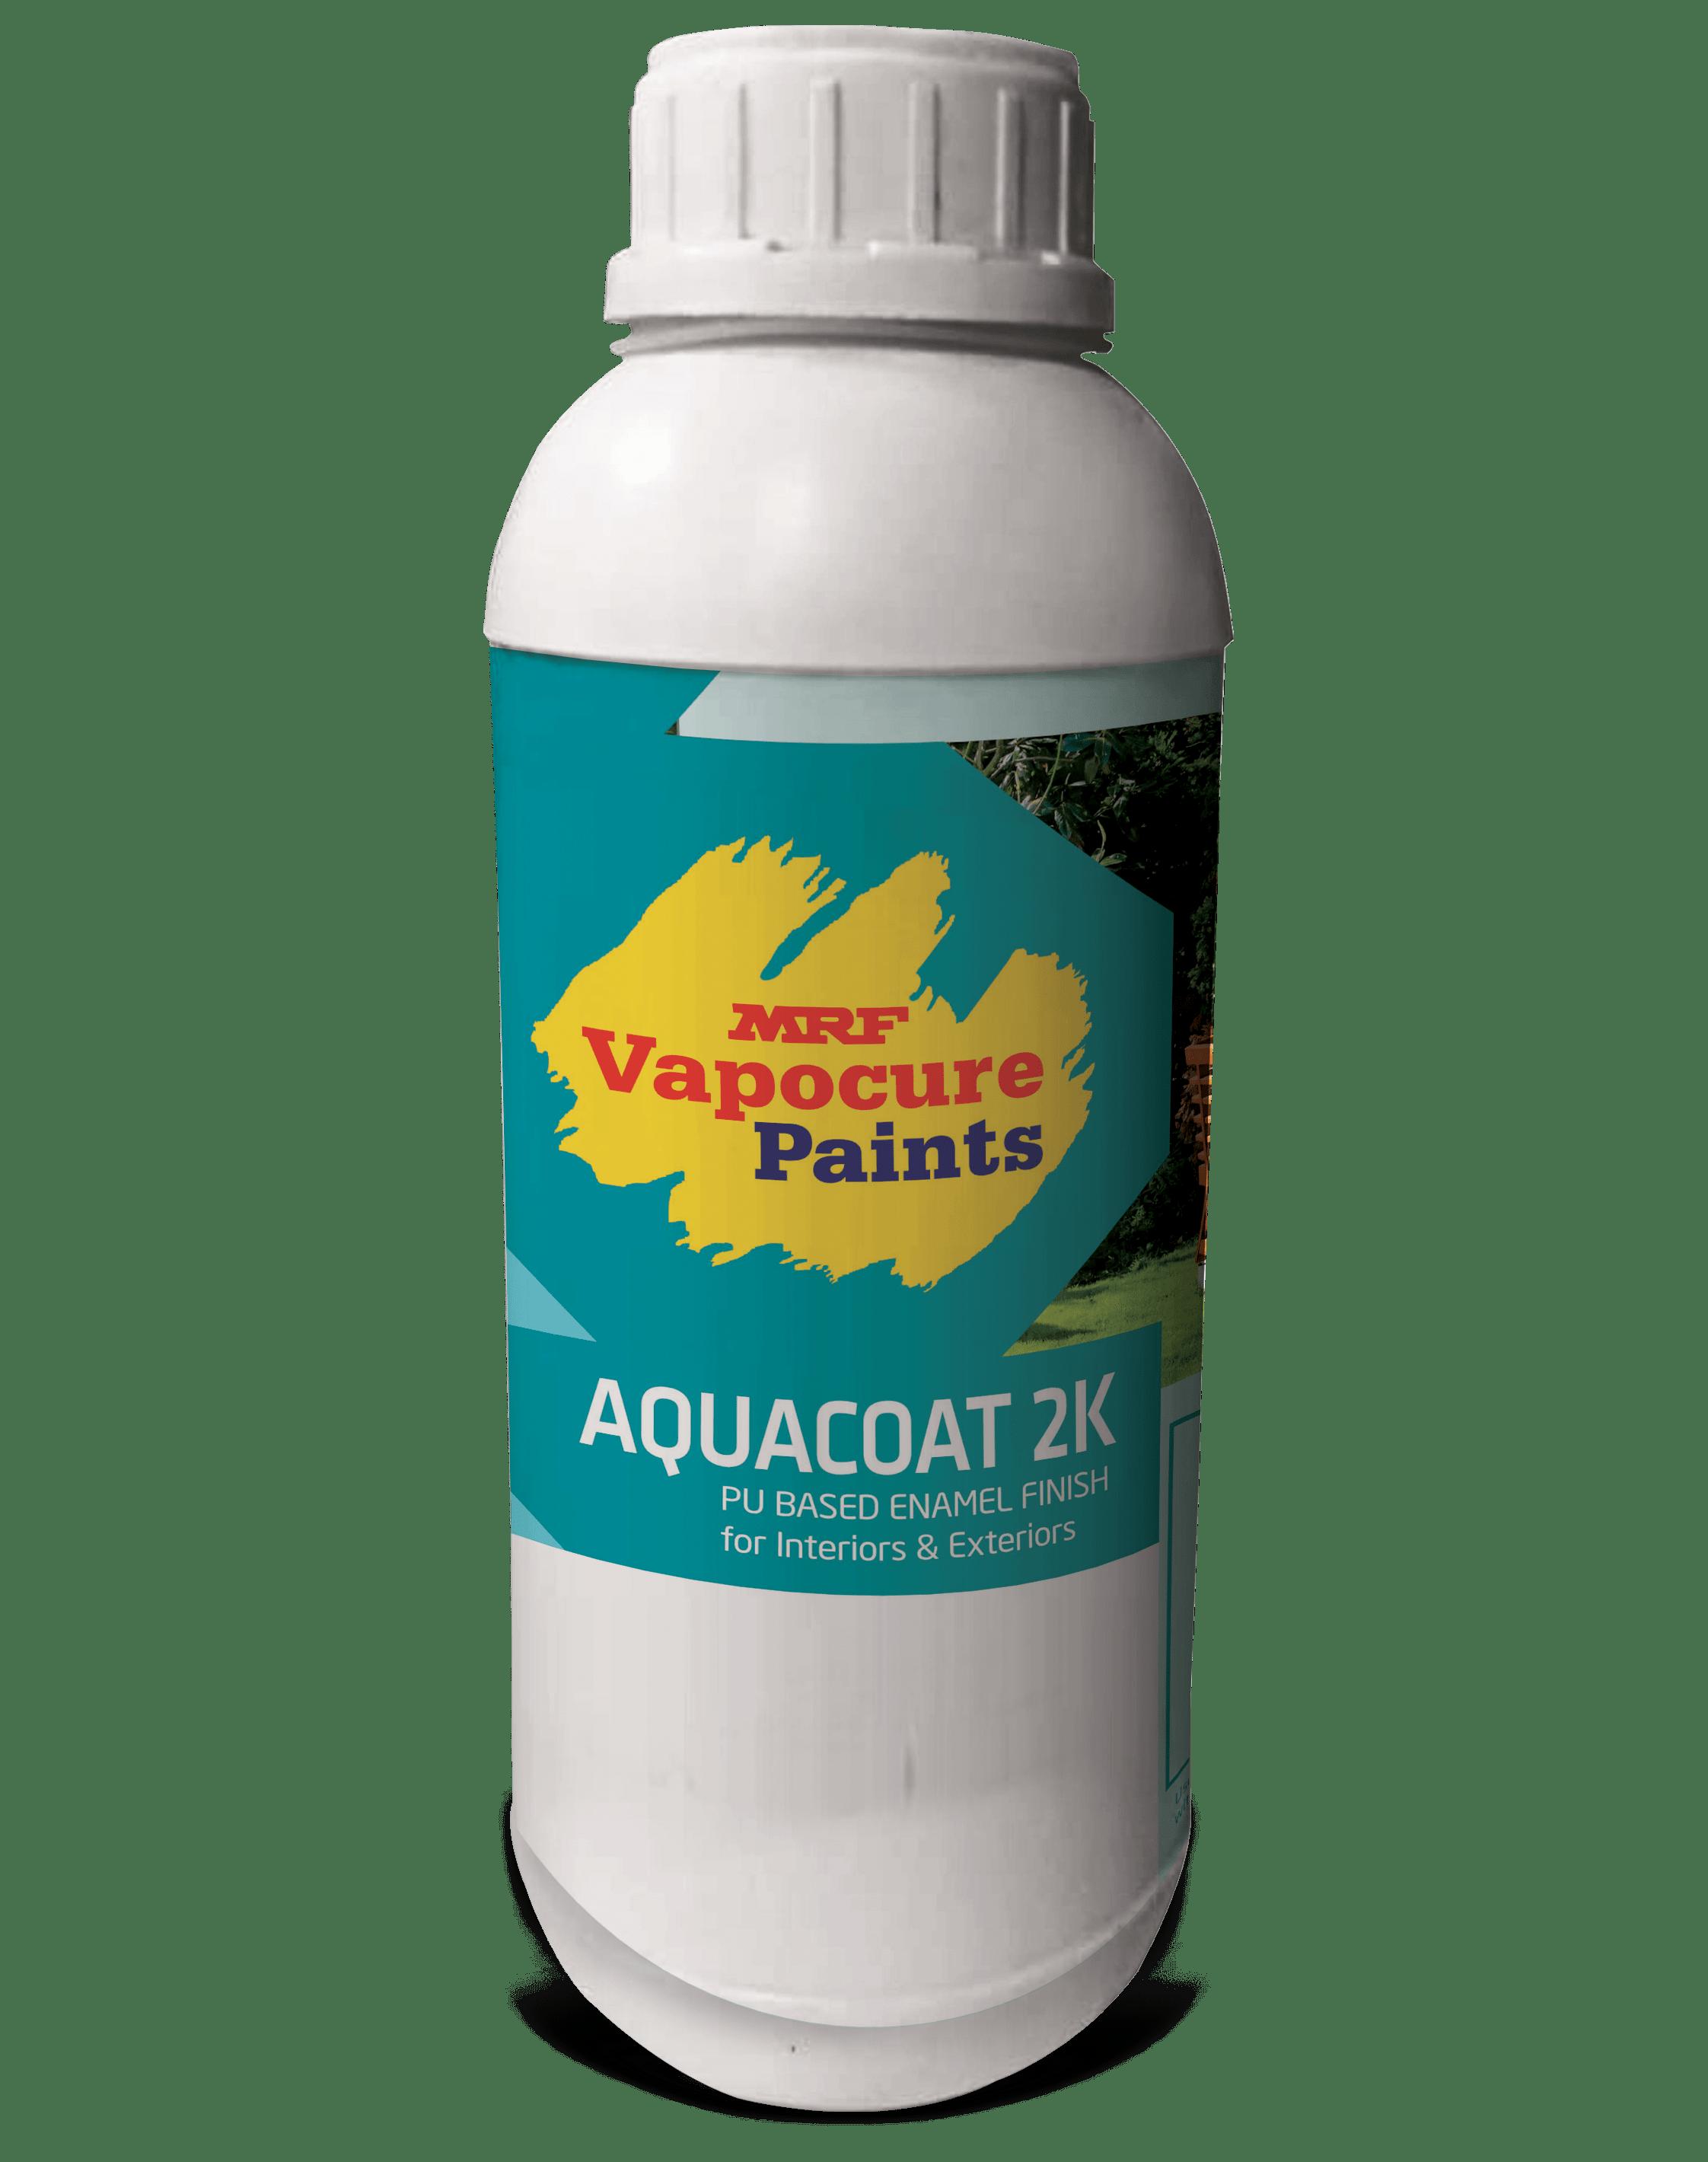 AquaCoat 2K PU